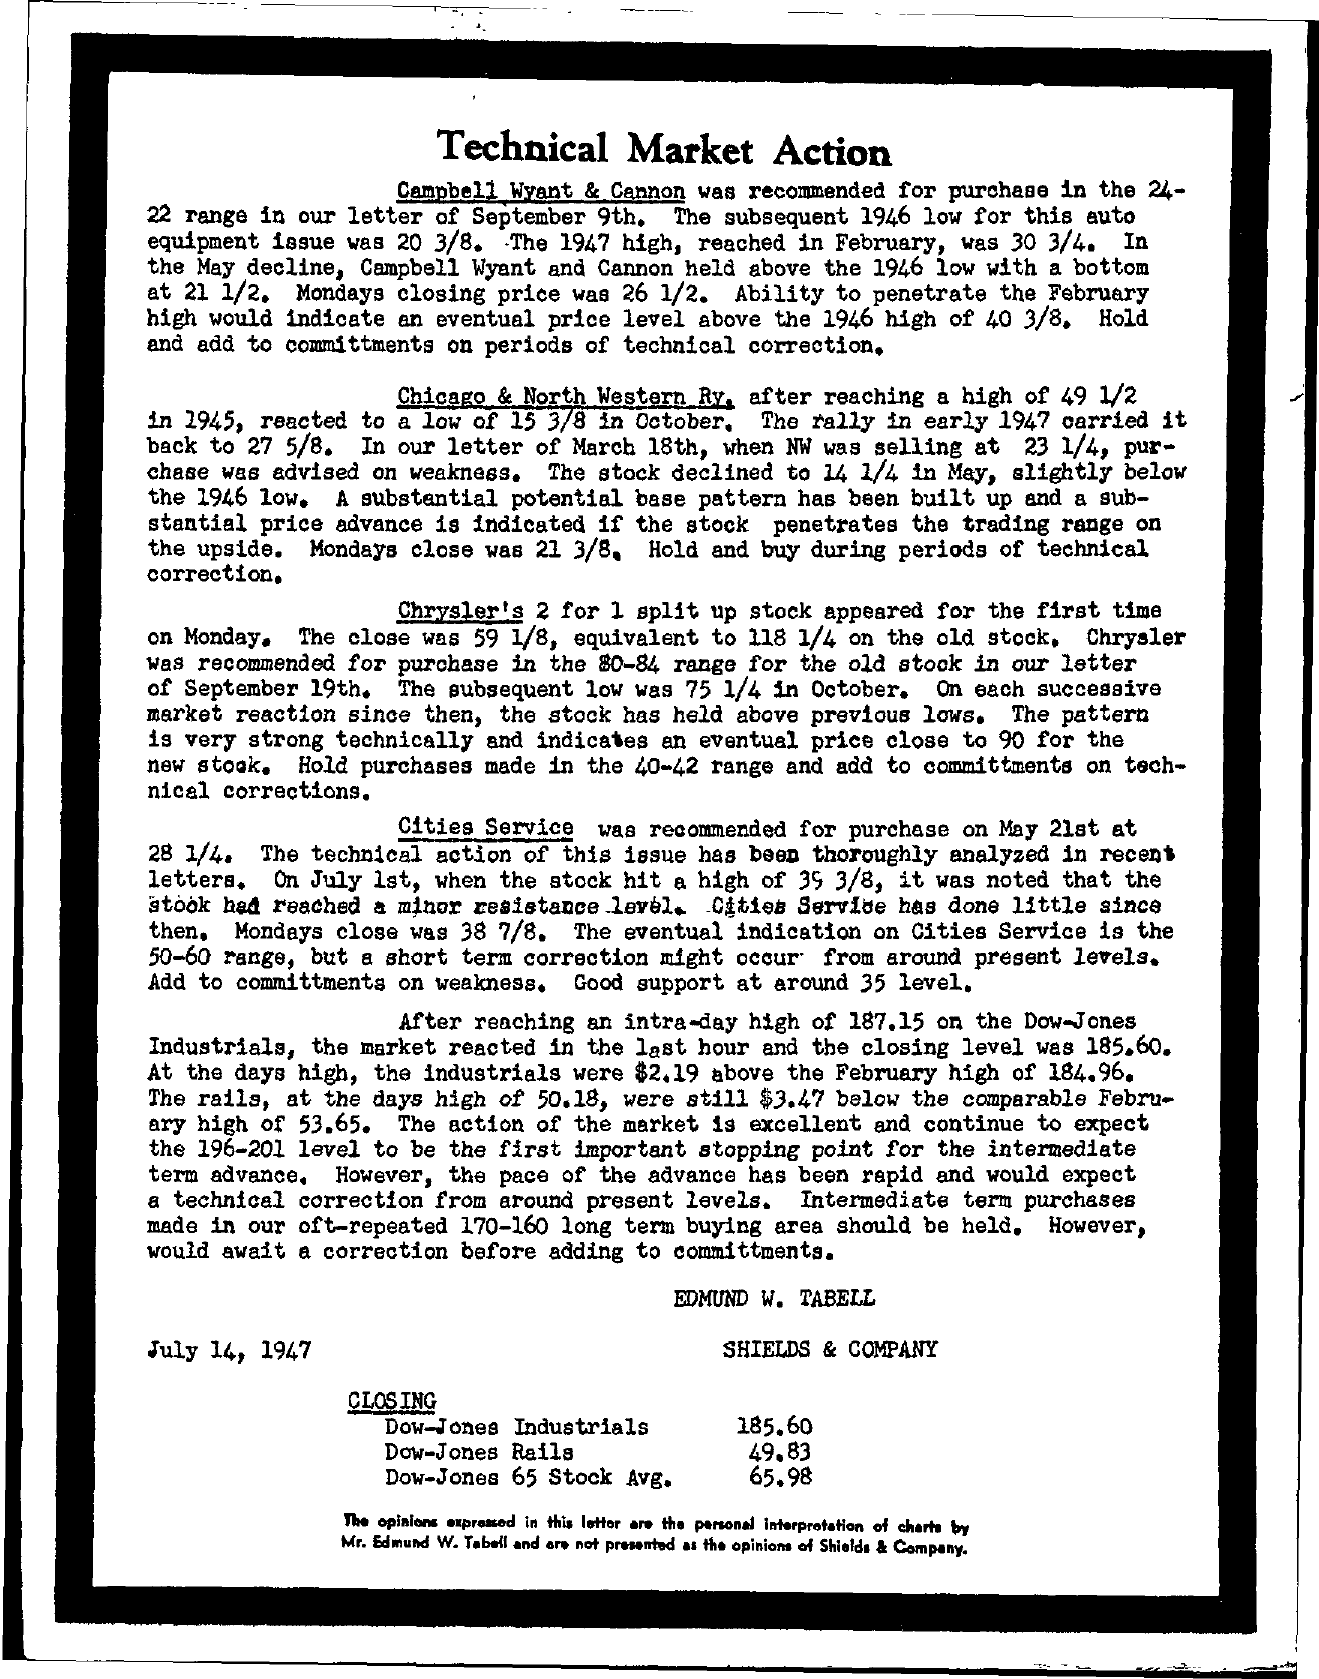 Tabell's Market Letter - July 14, 1947